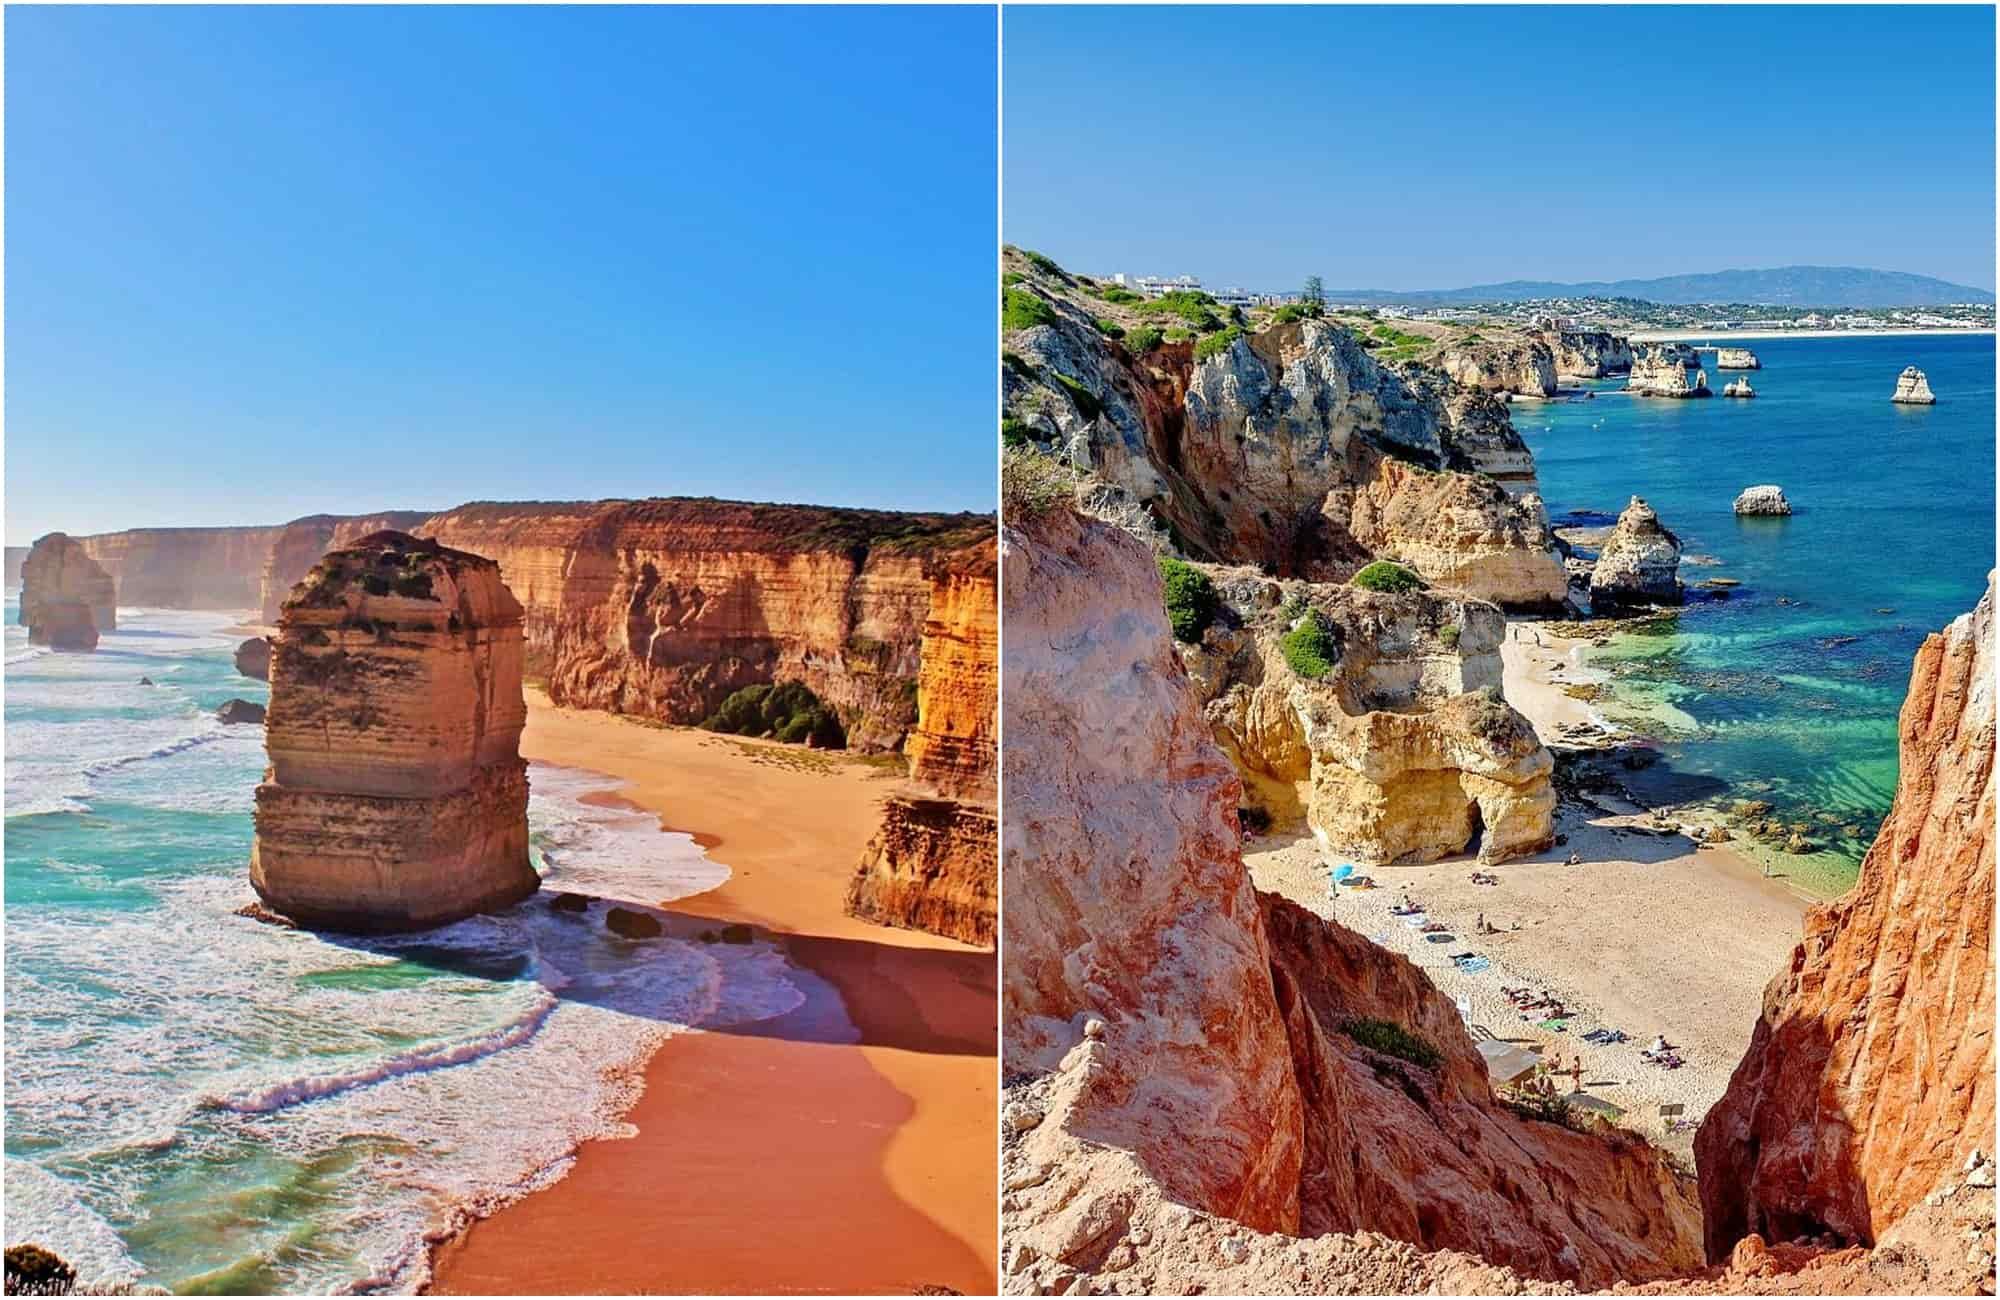 Voyage Portugal - Australie - Amplitudes